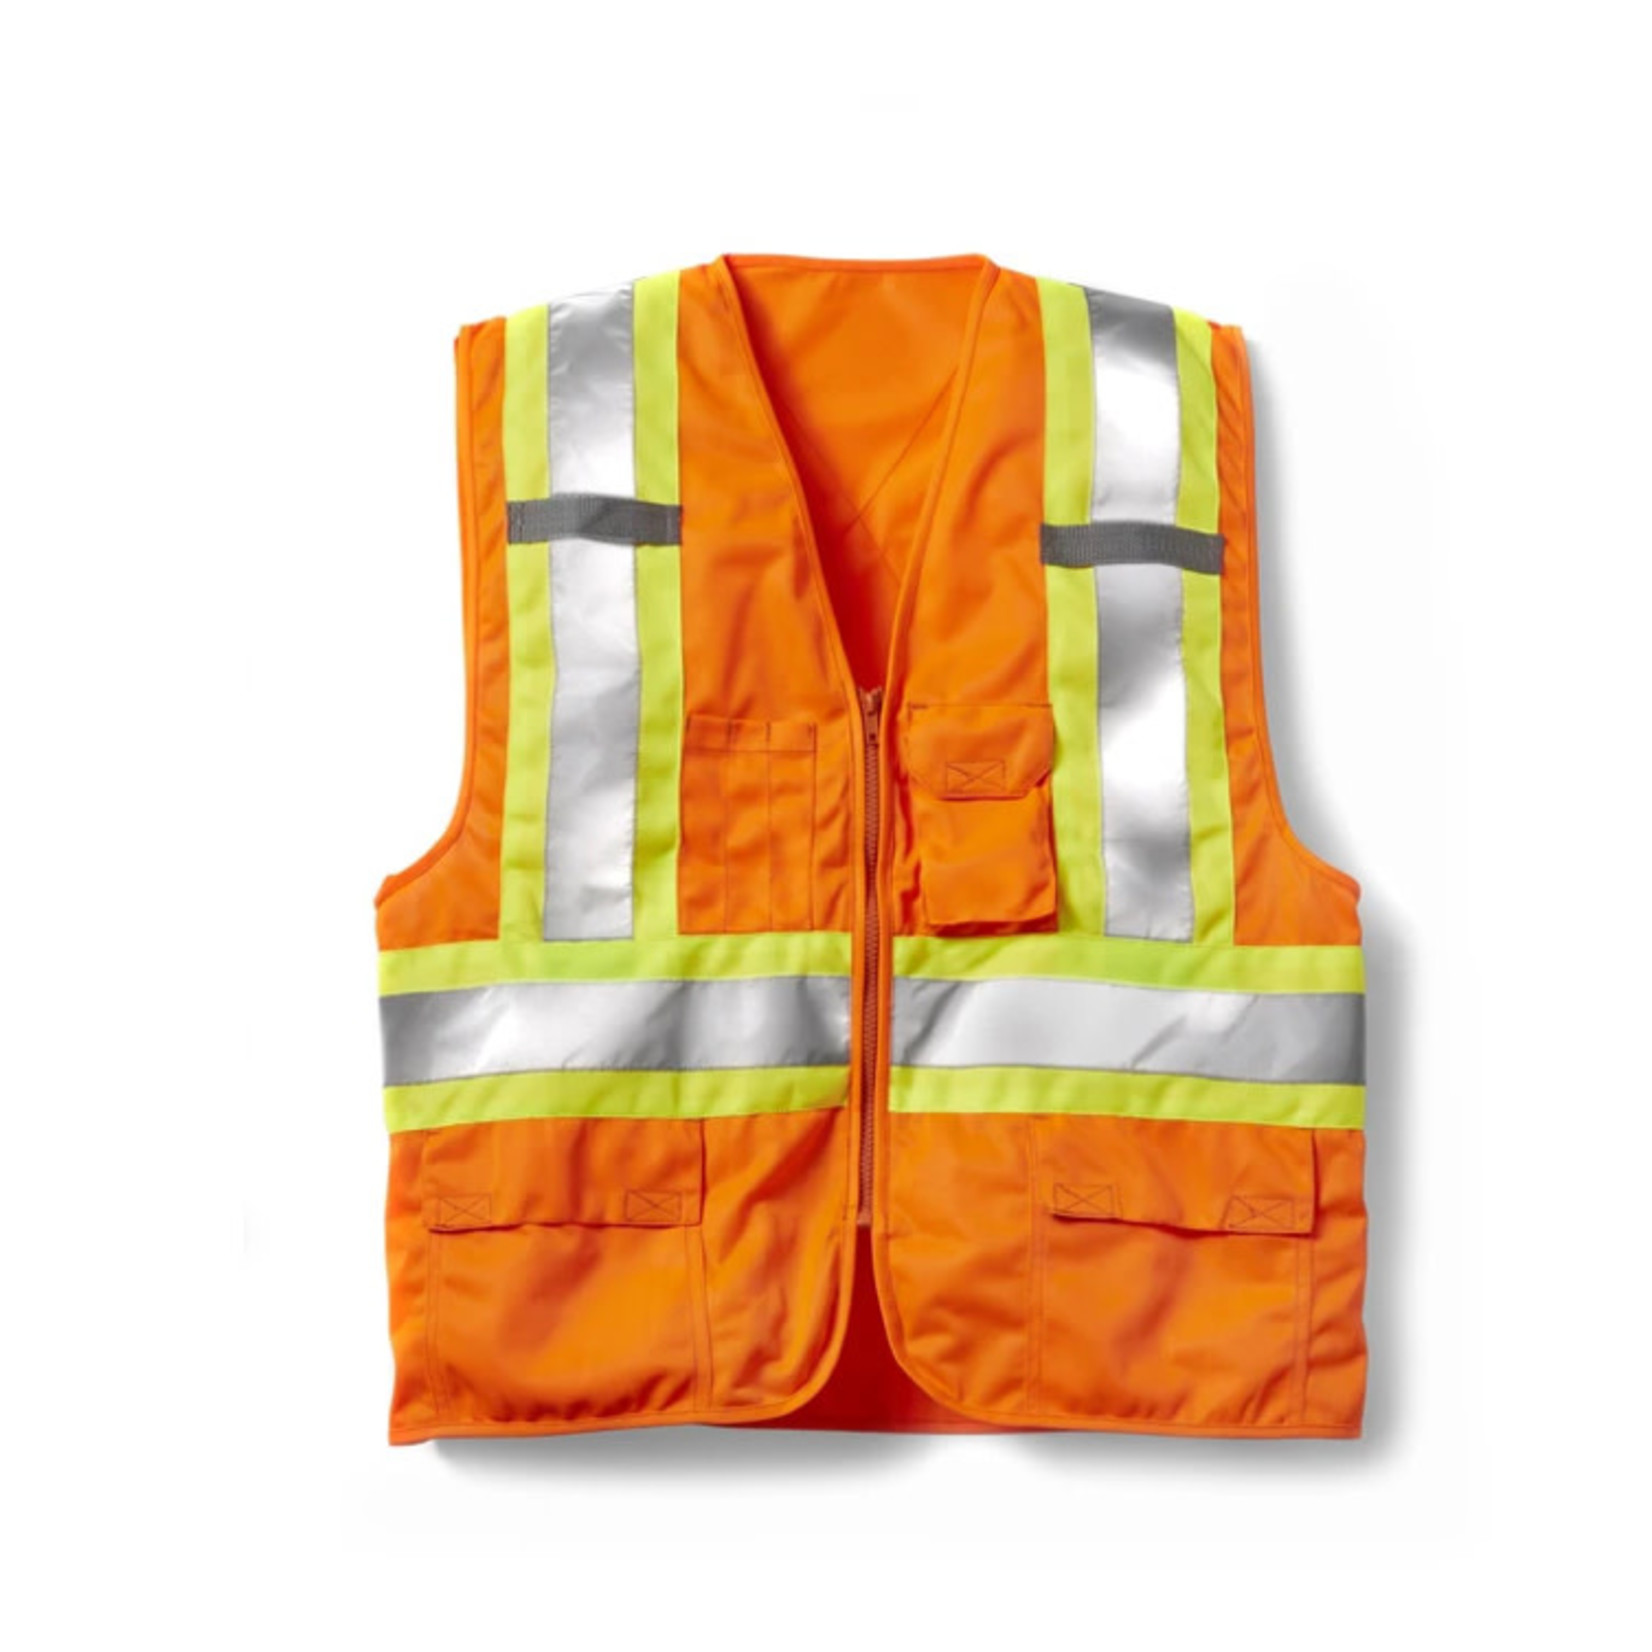 Rasco HV0050H Rasco Hi Vis Orange  Safety Vest Zip Front 100% Polyester